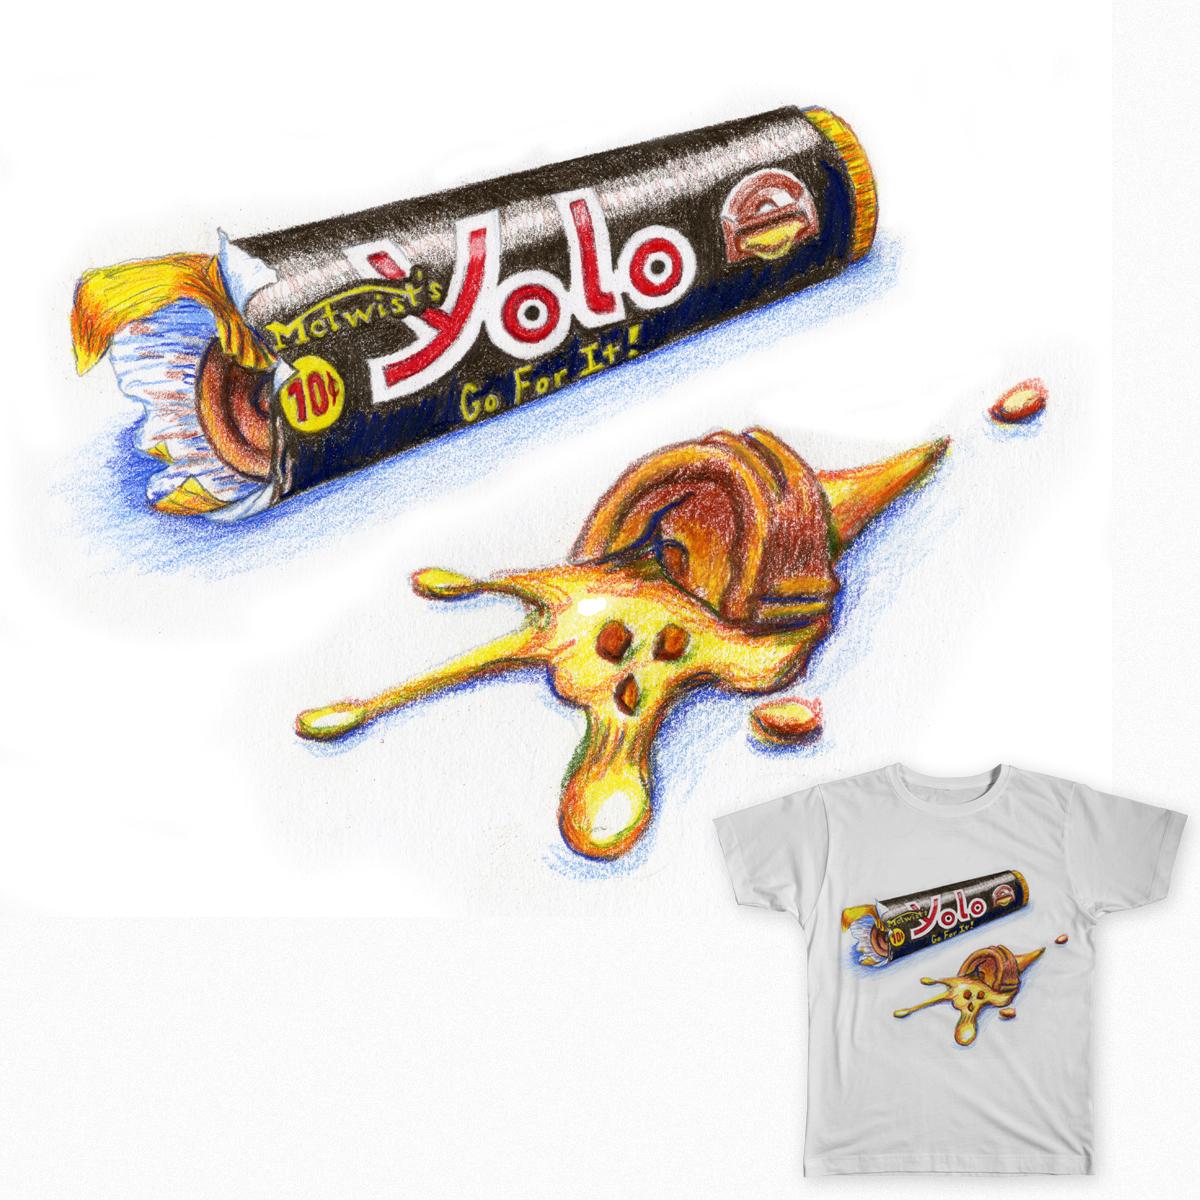 YOLO Chocolates by AuntieVAVA on Threadless